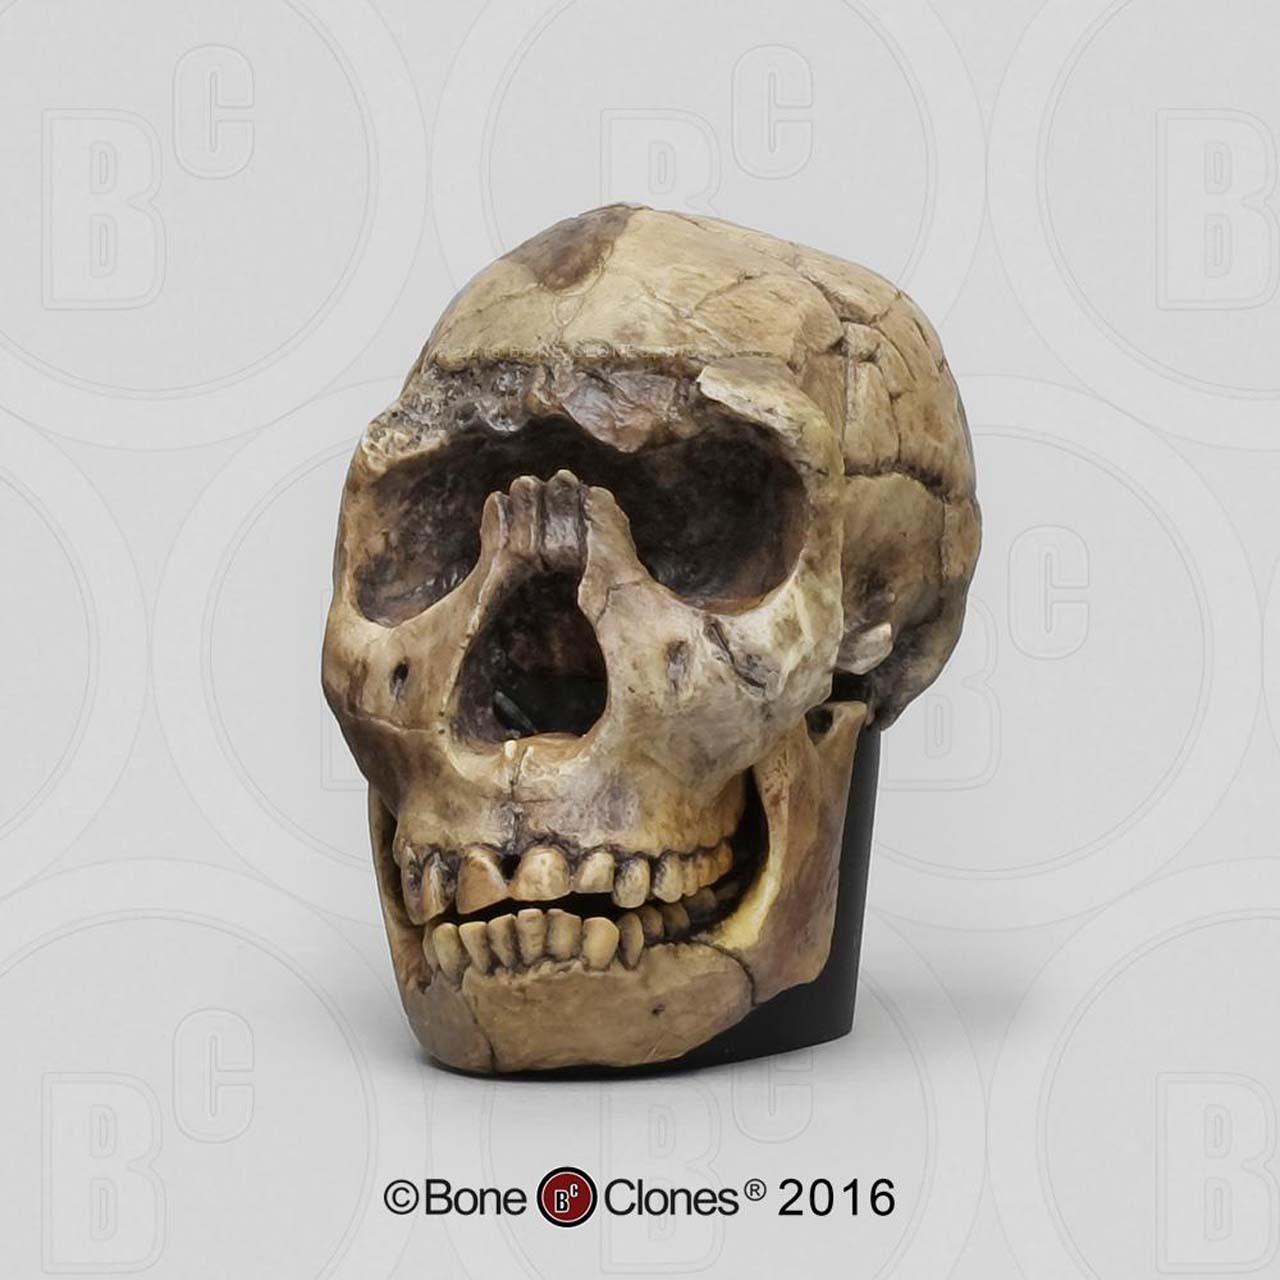 Hominin evolution half scale set of 4 skulls with individual bases. Ardipithecus ramidus, Australopithecus afarensis, Homo ergaster and Homo neandertalensis.